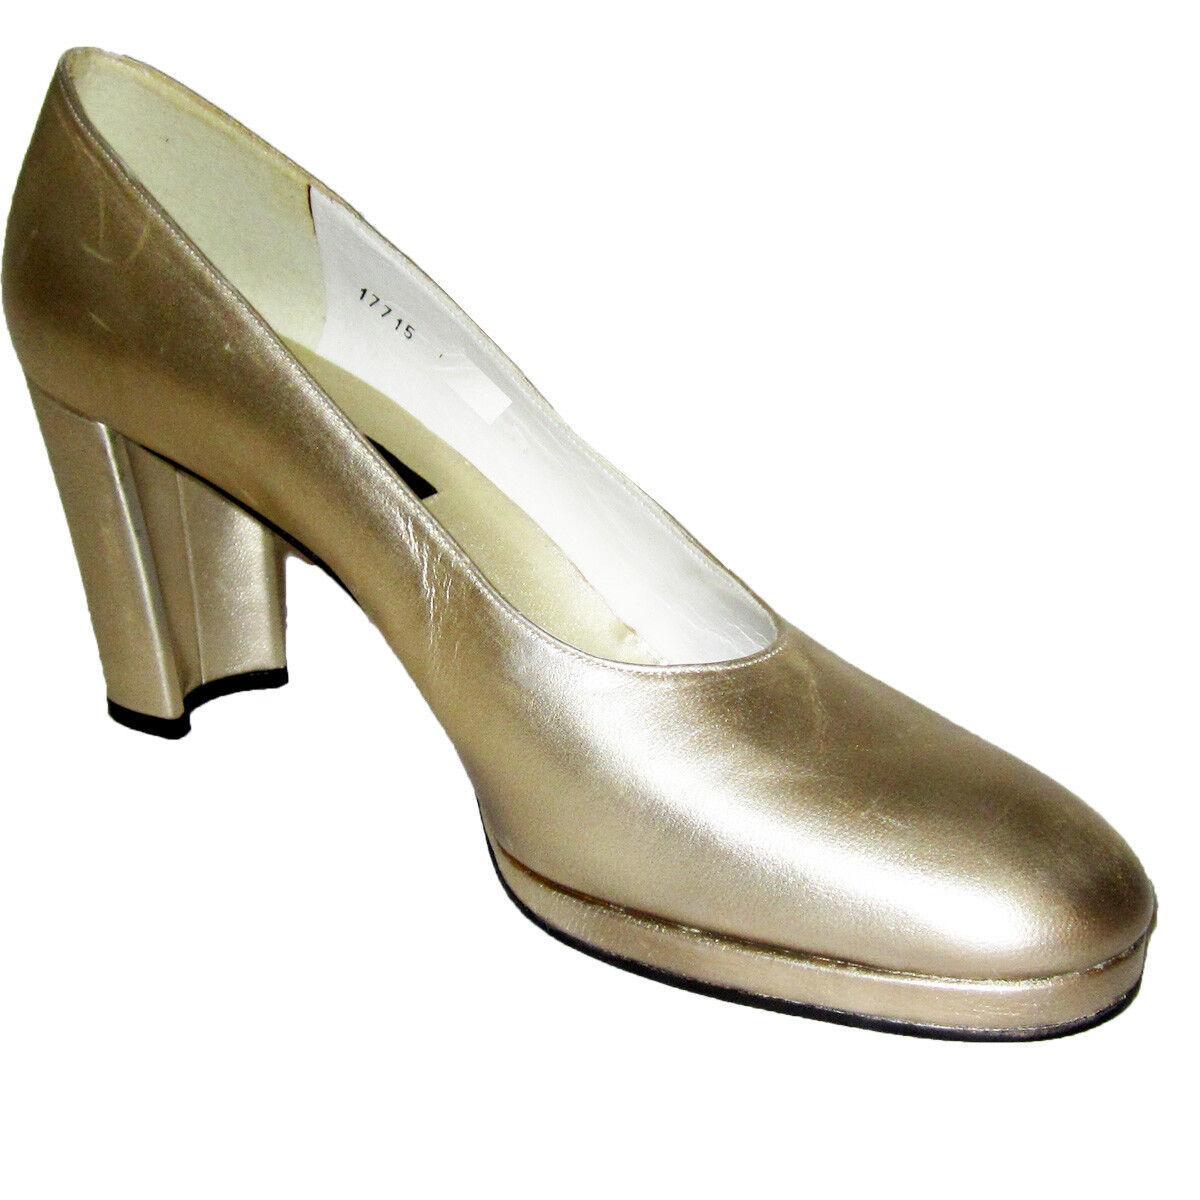 New  STUART WEITZMAN gold  Grable  Retro PinUp HEELS 10S Pumps shoes